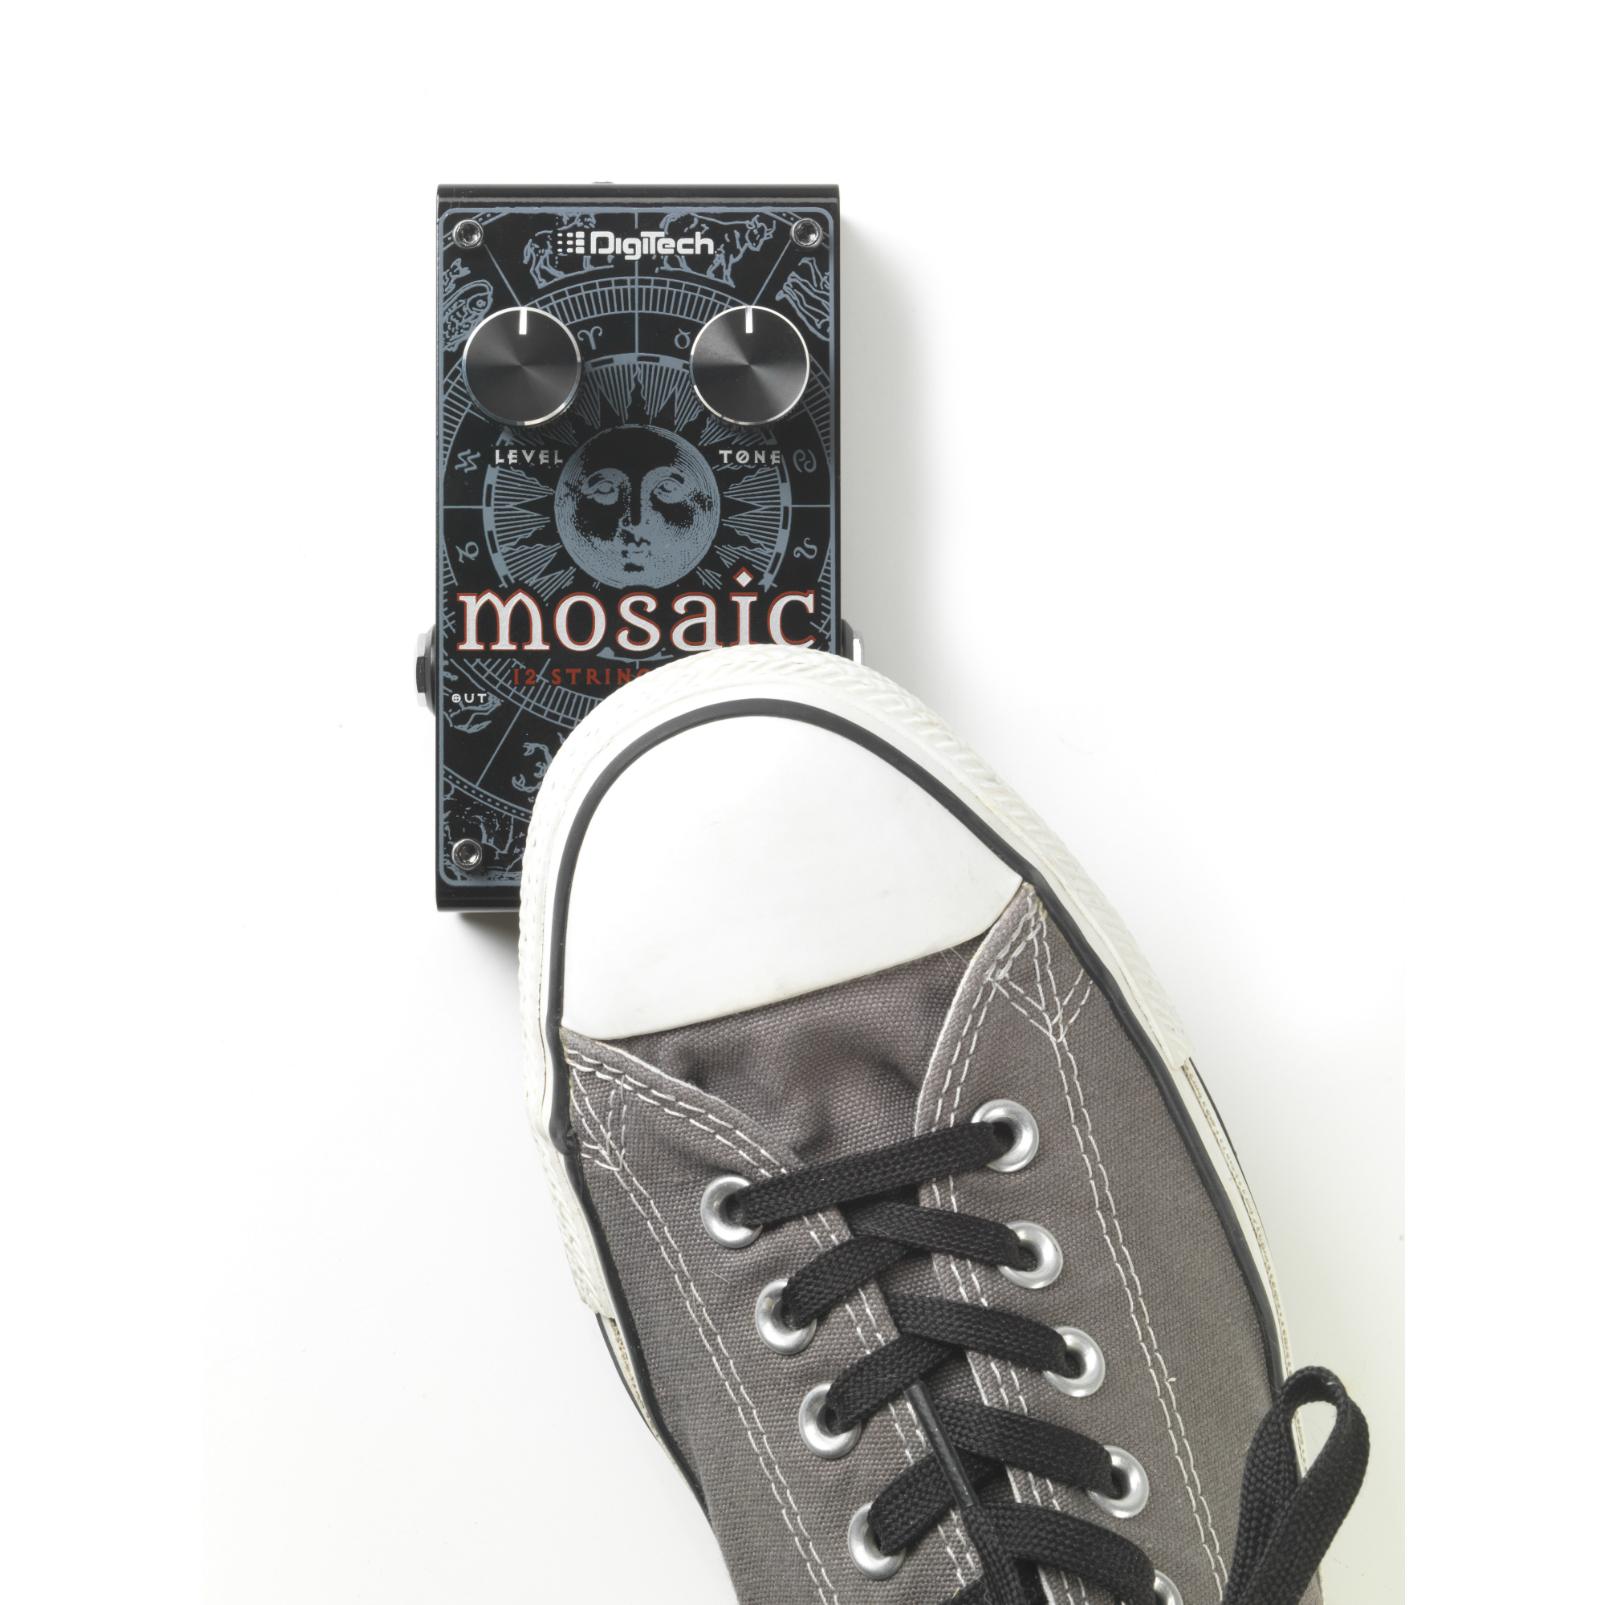 Mosaic - Black - Polyphonic 12-String Effect Pedal - Detailshot 4